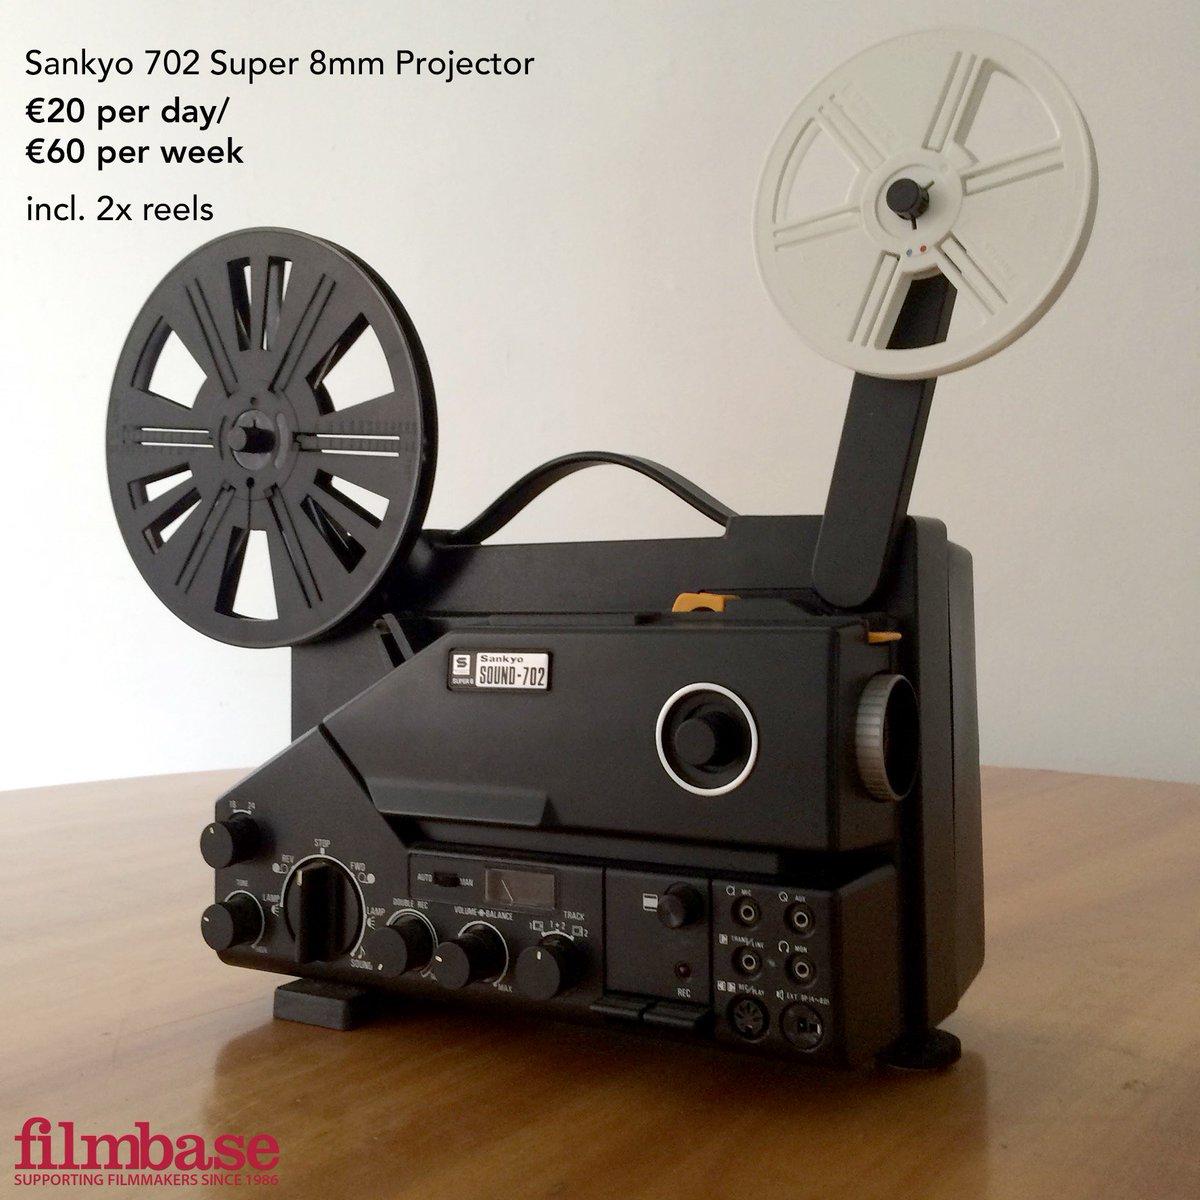 Filmbase Equipment (@FilmbaseEquip) | Twitter